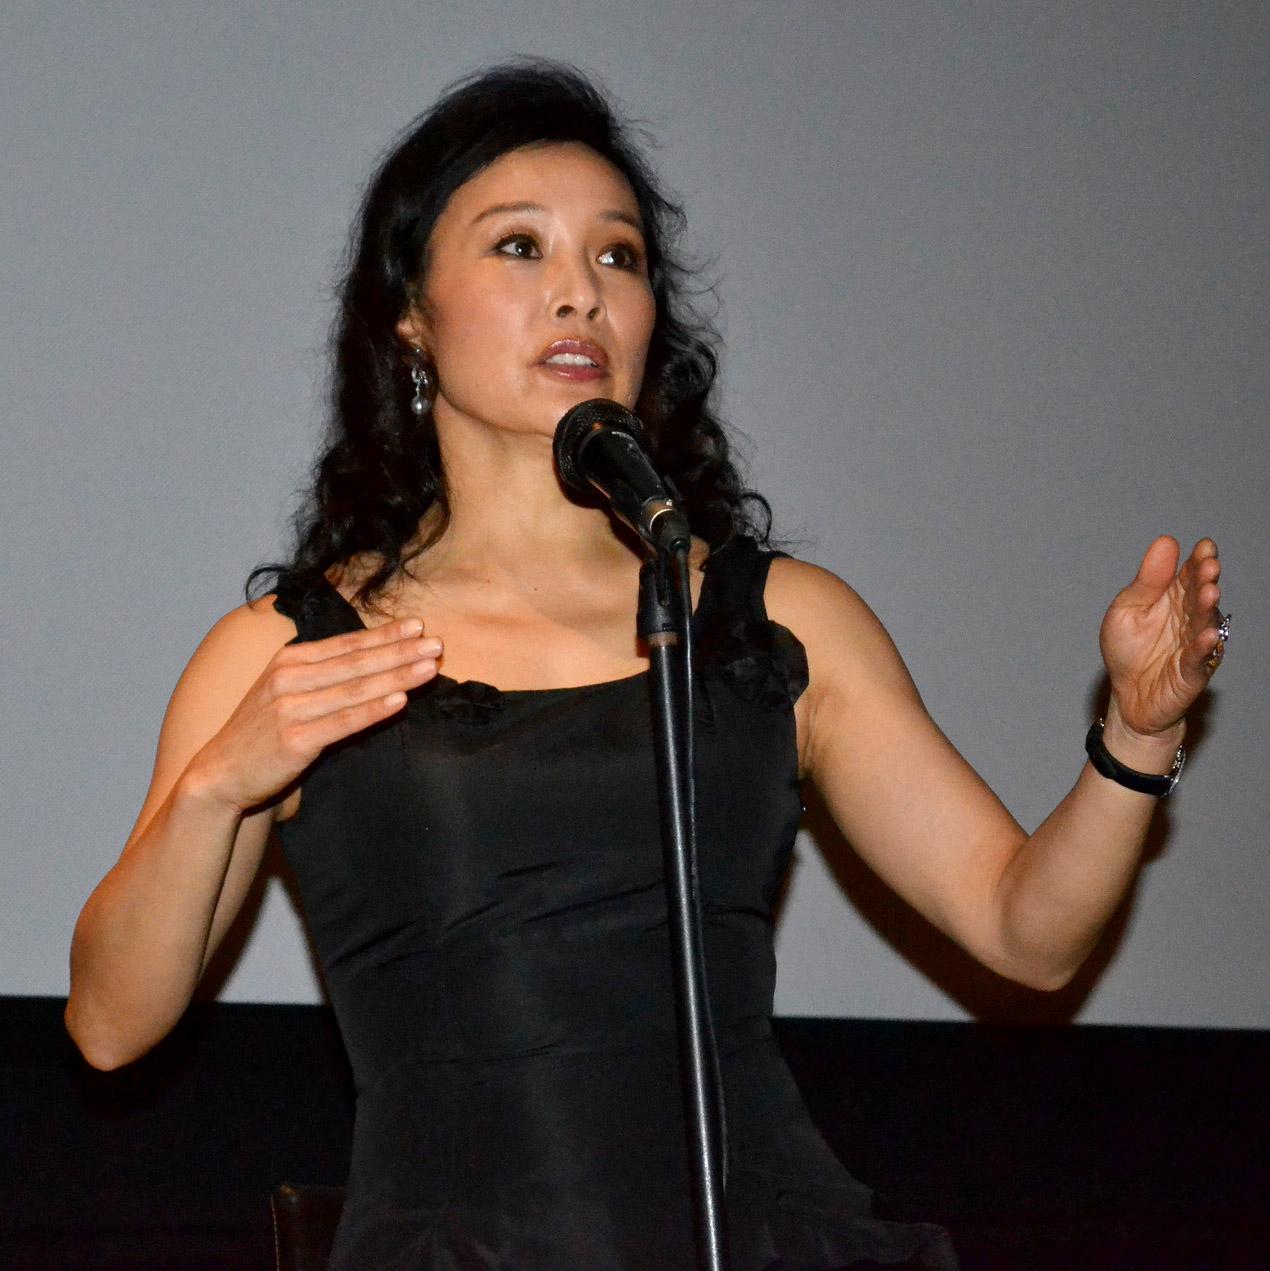 Photo Joan Chen via Opendata BNF